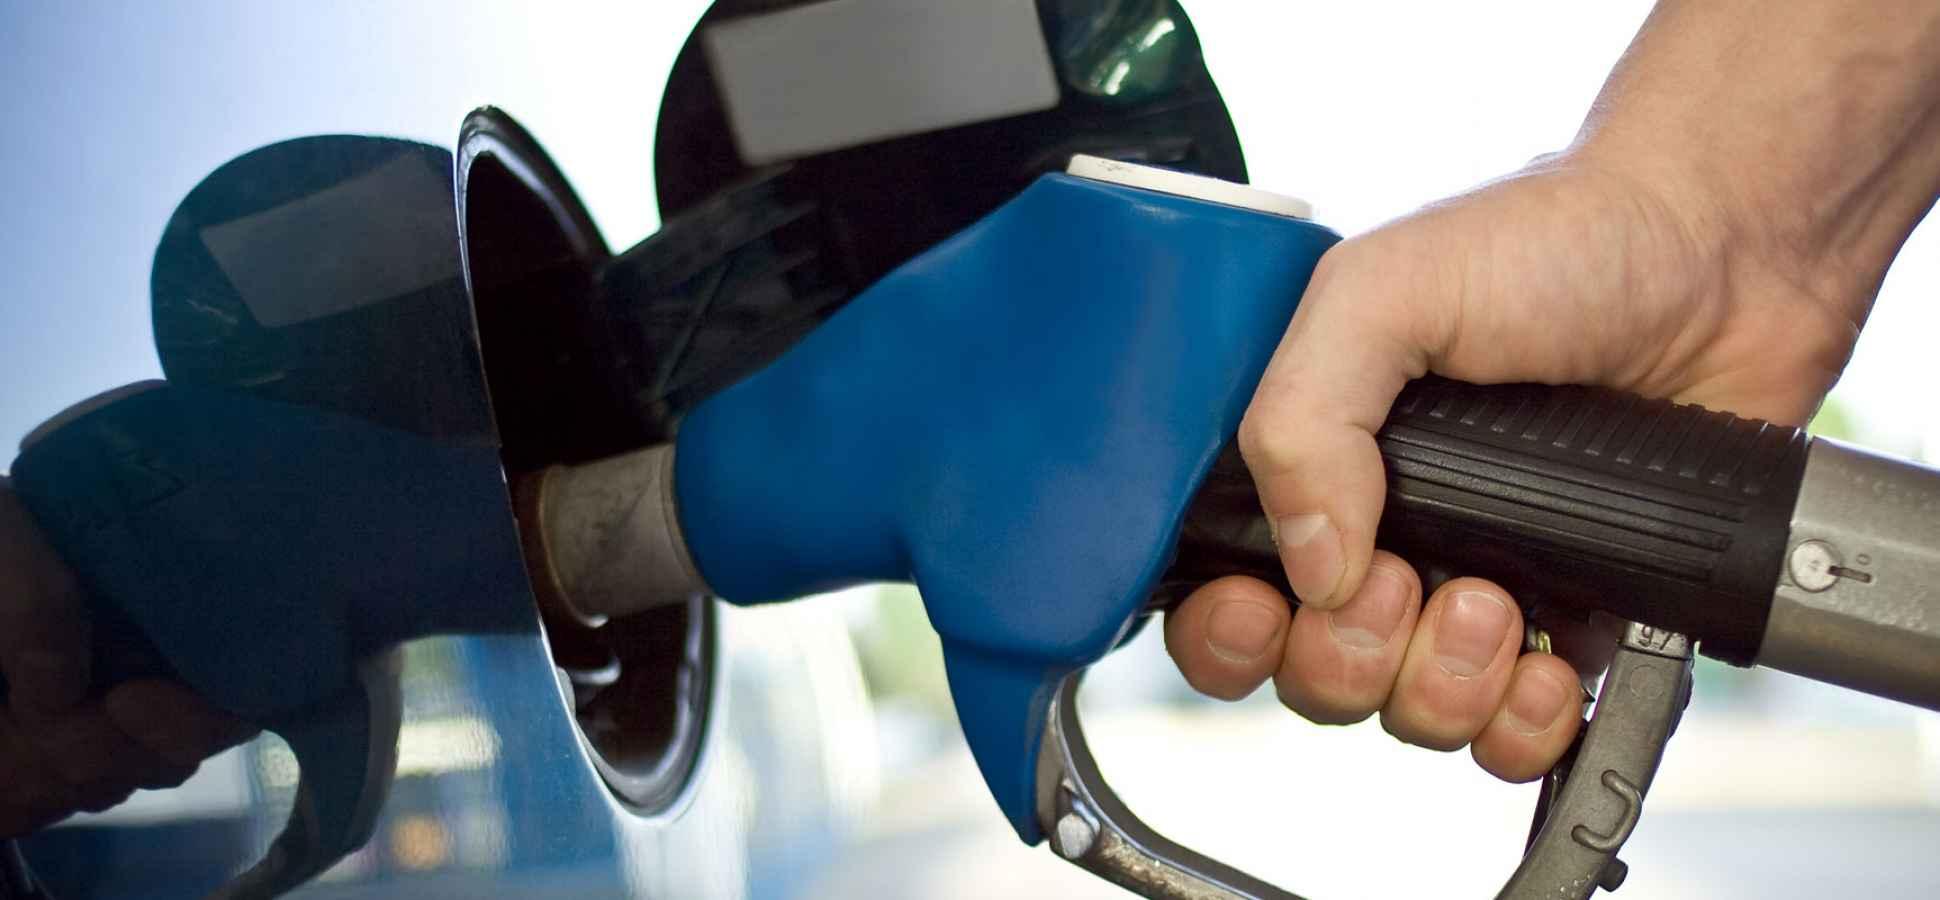 pump-gas-1725x810_23121 (1)